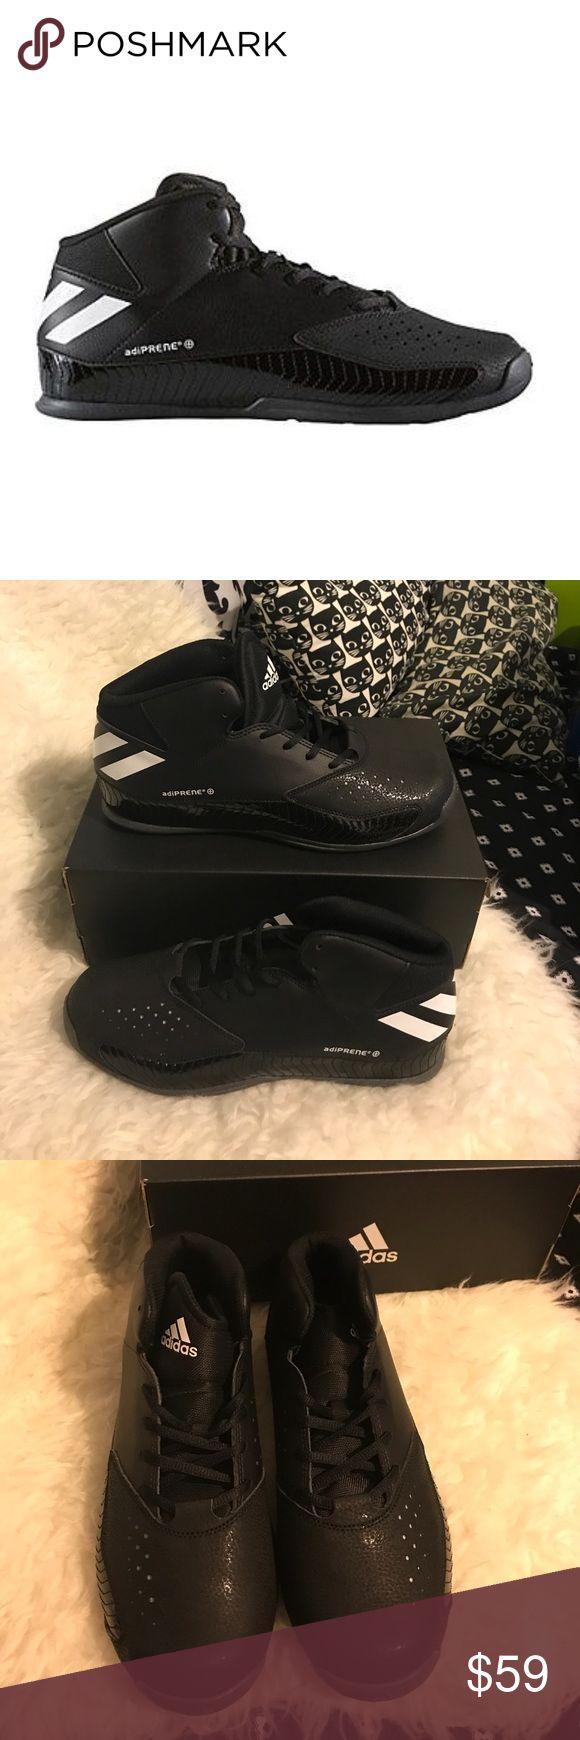 Adidas nxt lvl spd v Adidas shoes nxt lvl spd v brand new adidas Shoes